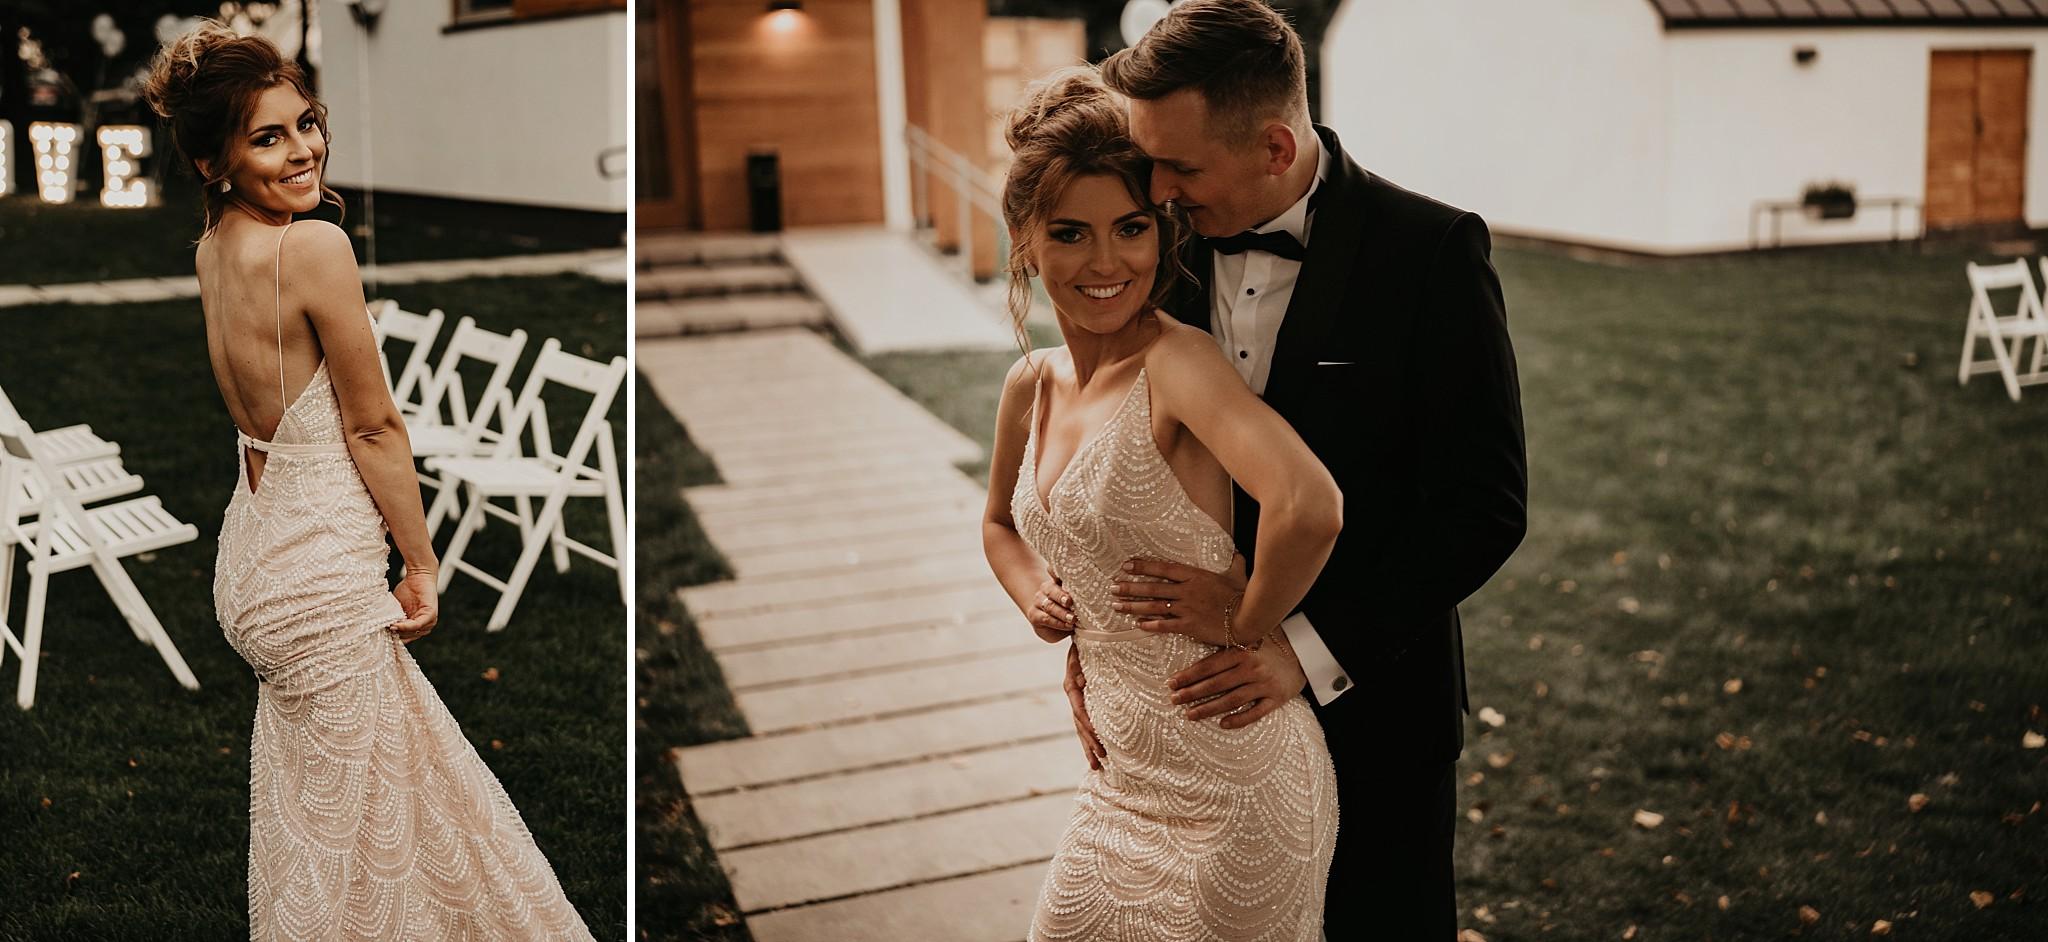 fotograf poznan wesele dobra truskawka piekne wesele pod poznaniem wesele w dobrej truskawce piekna para mloda slub marzen slub koronawirus slub listopad wesele koronawirus 362